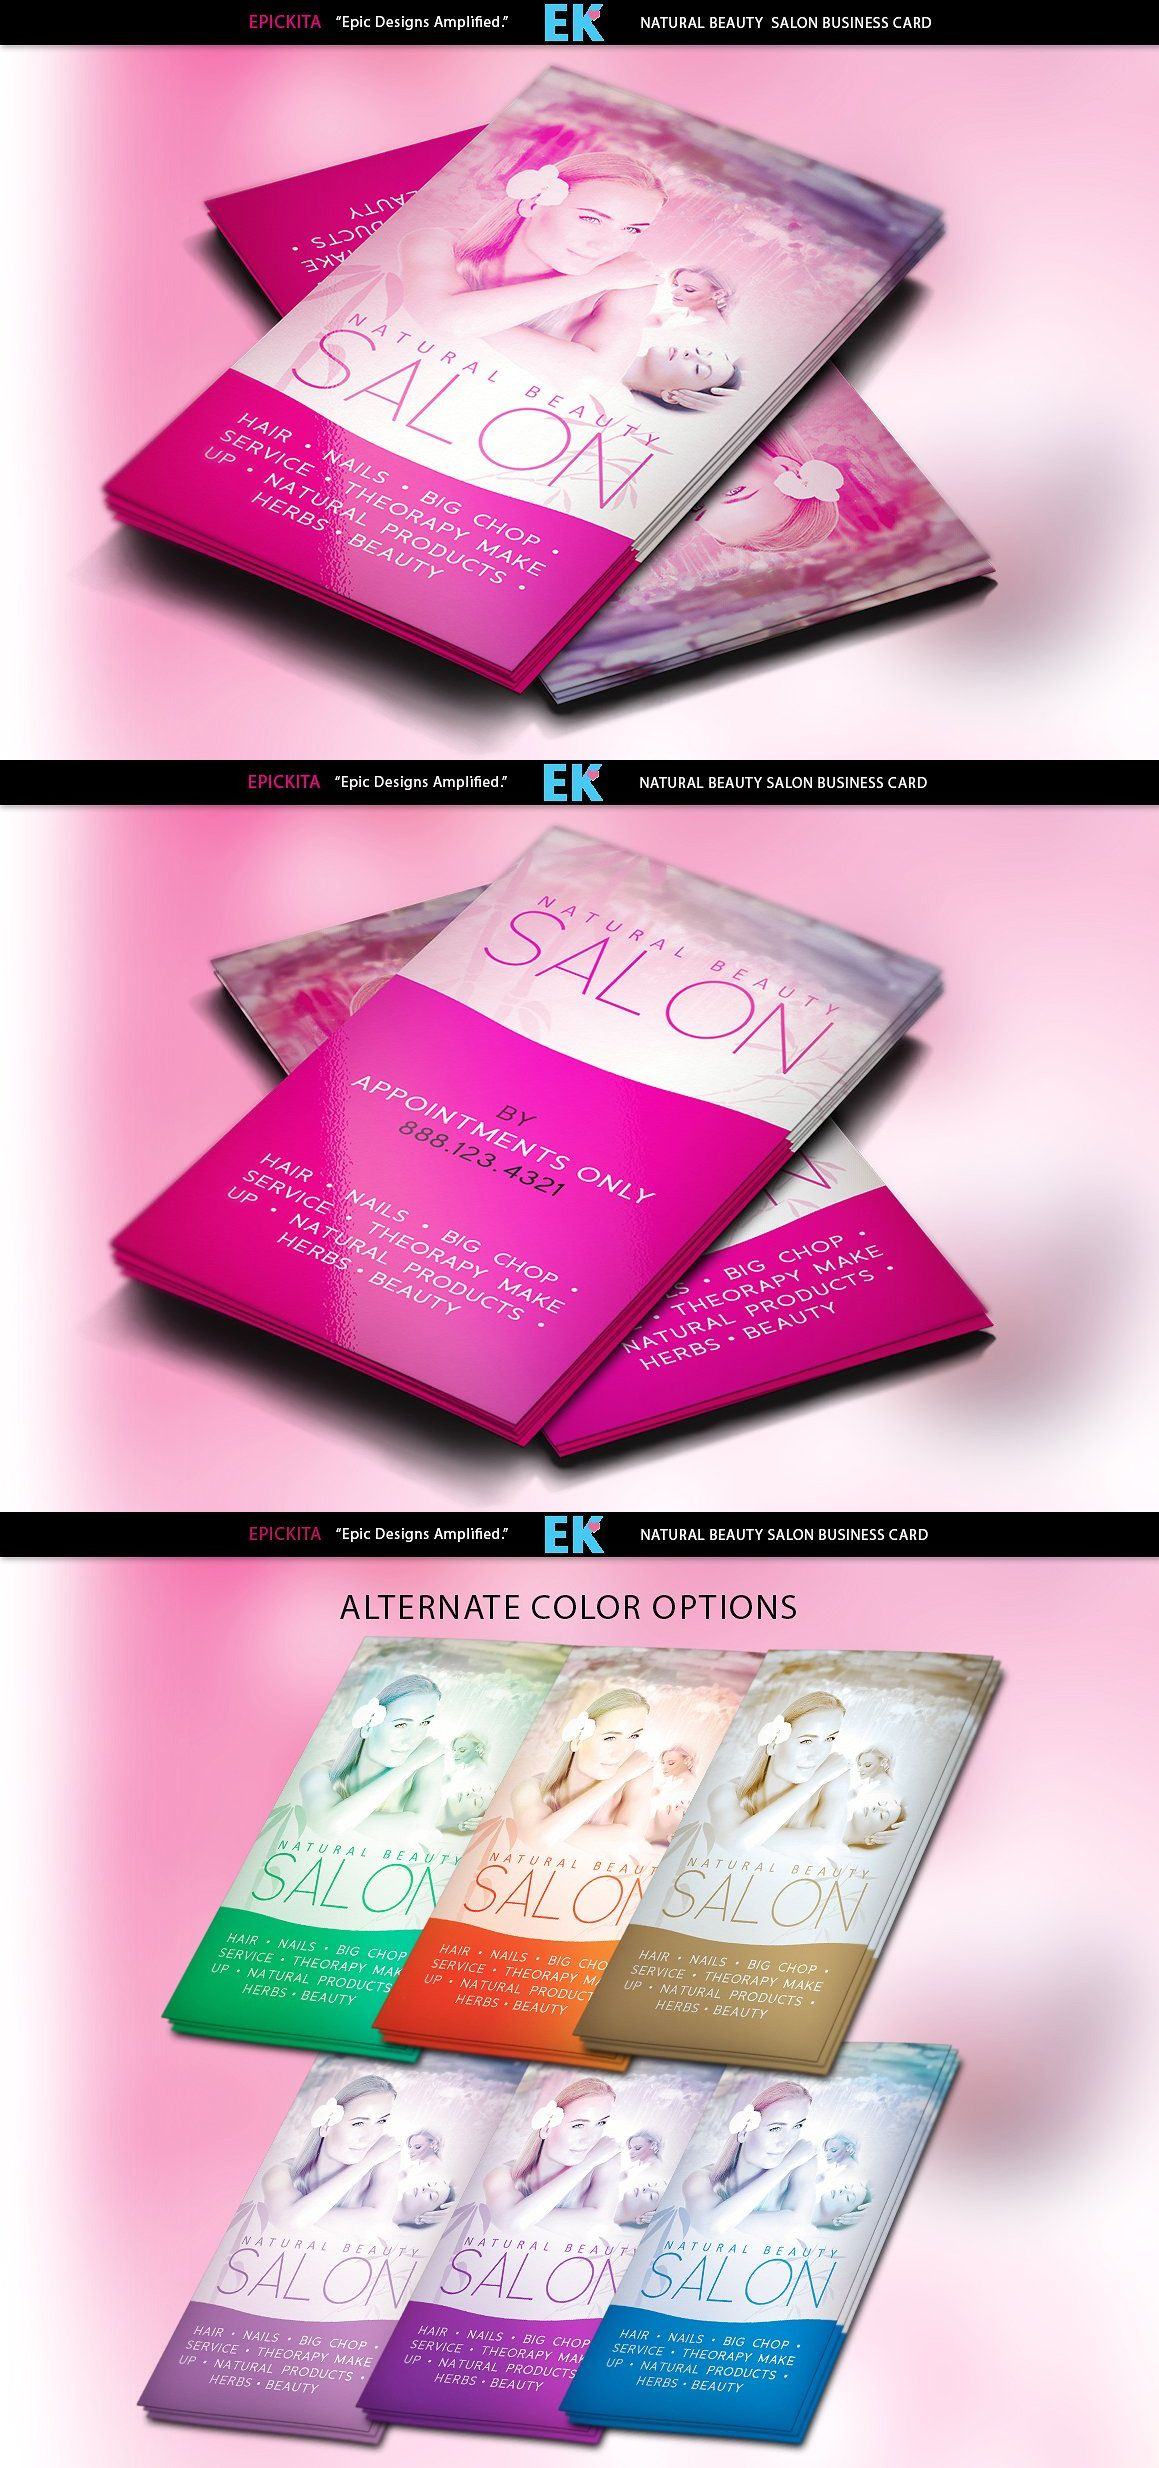 Natural Beauty Salon Business Cards Templates PSD | Business Card